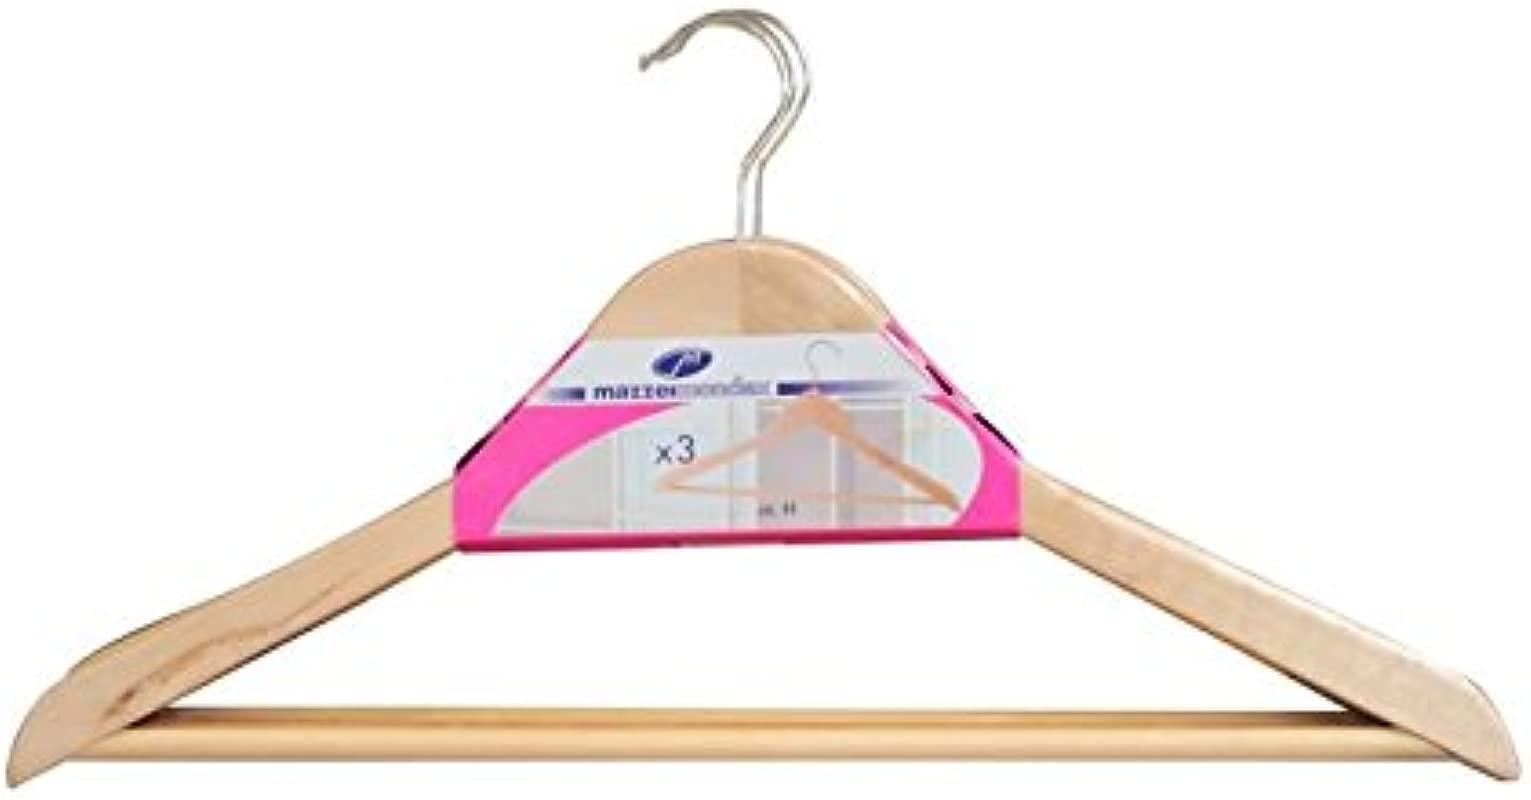 M Home Mon 9300 Triangular Hanger Set Varnished Wood Size 45 Cm Multi Colour Each